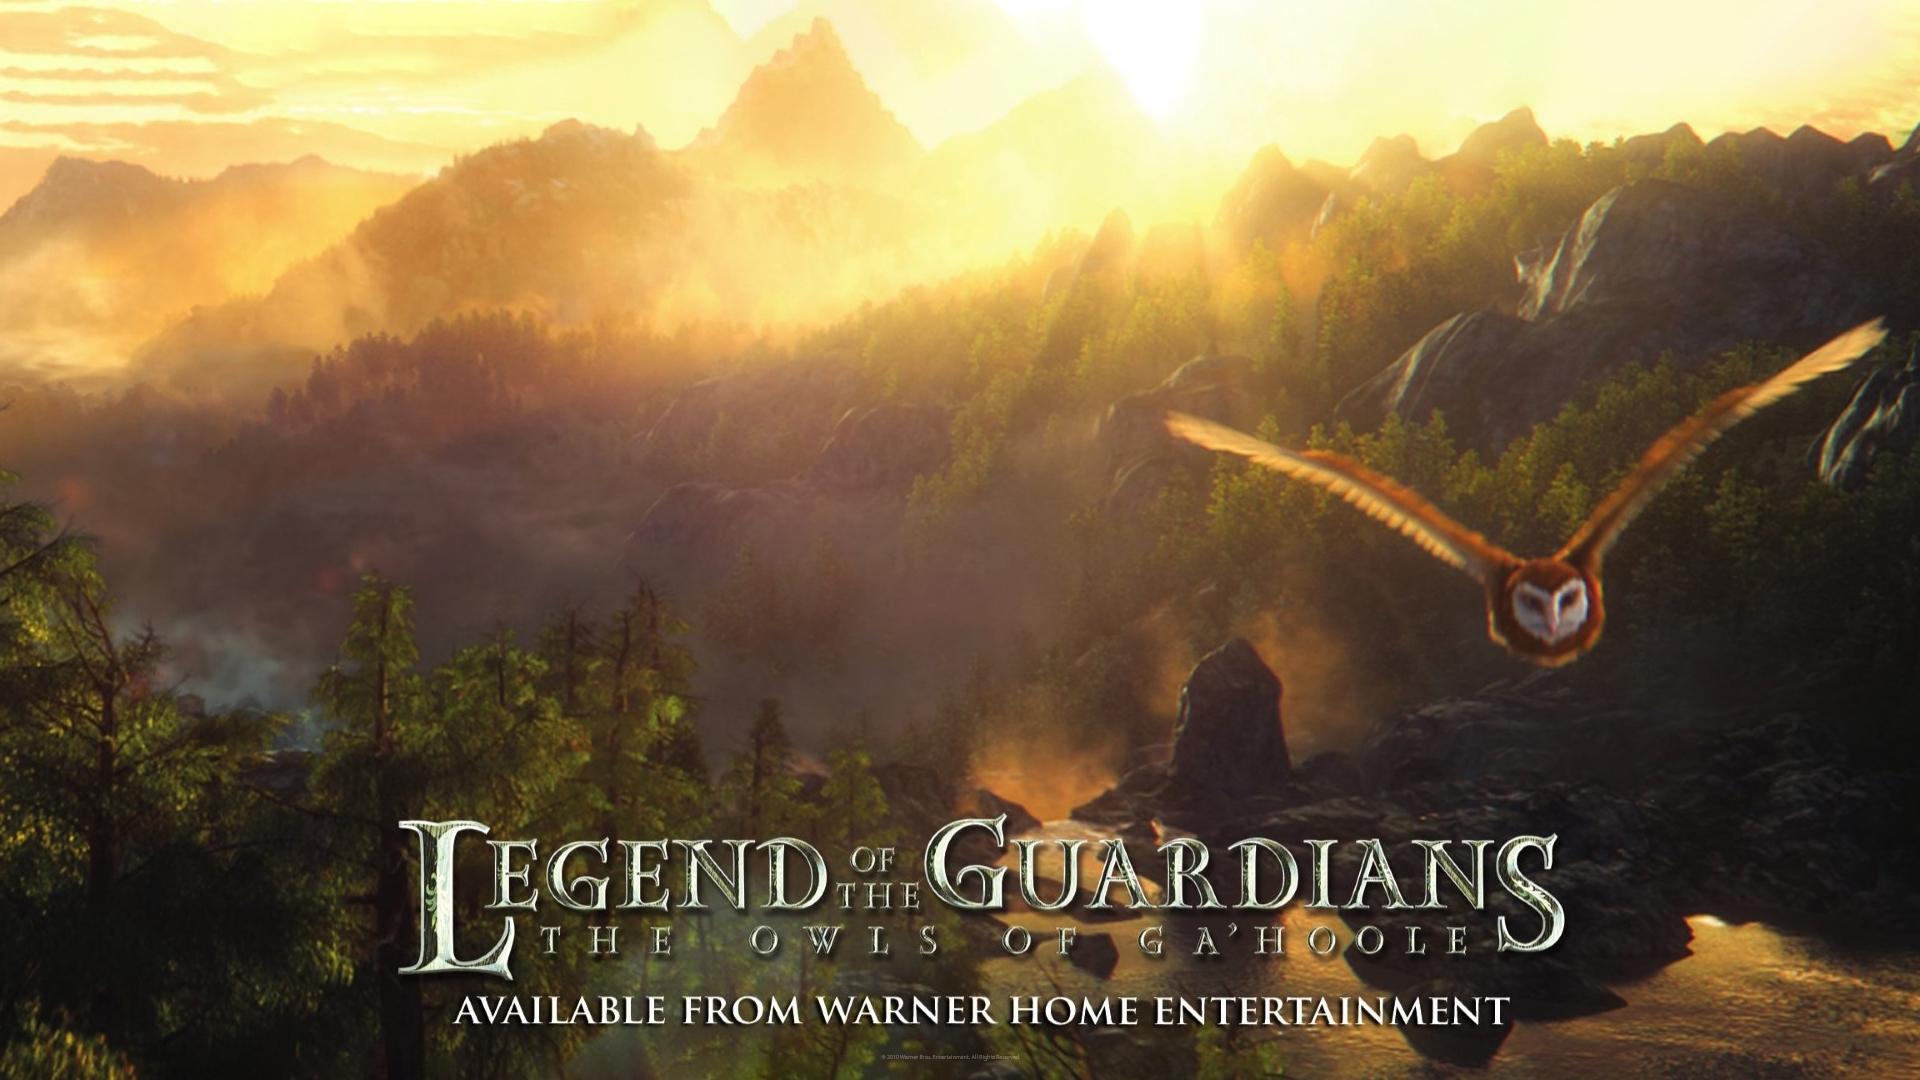 Legend of the Guardians: The Owls of Ga'Hoole มหาตำนานวีรบุรุษองครักษ์ : นกฮูกผู้พิทักษ์แห่งกาฮูล